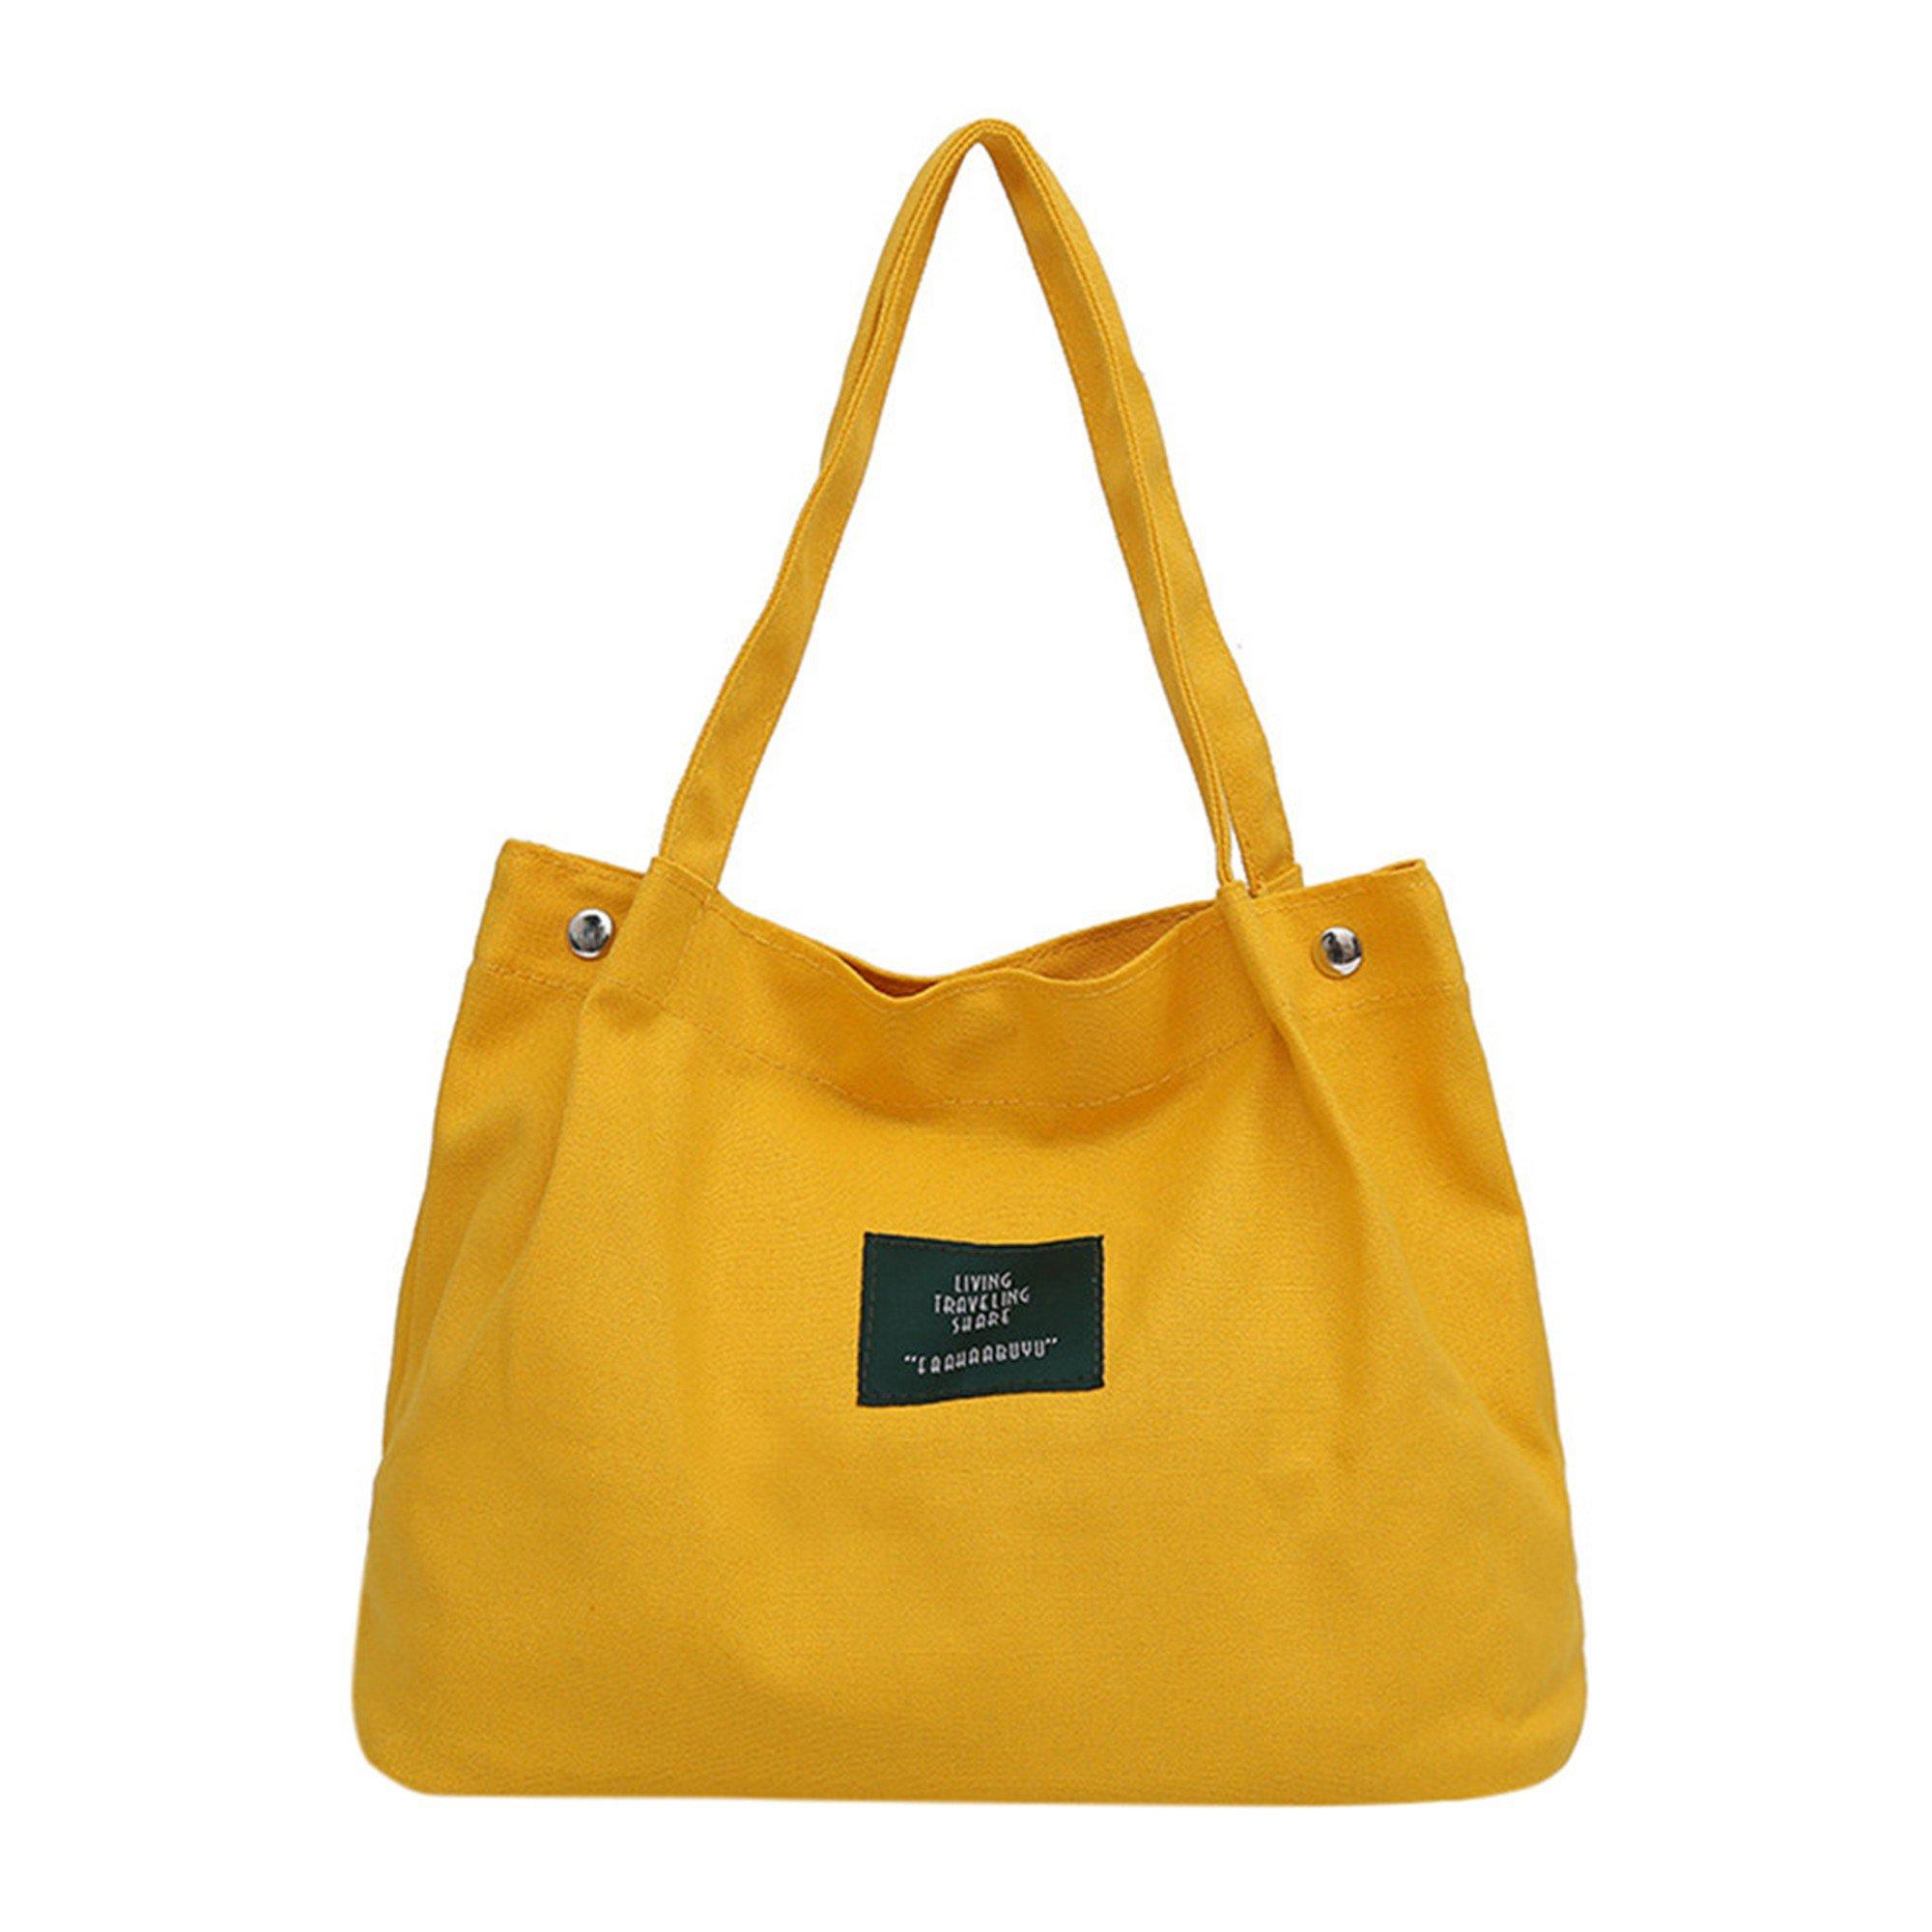 SFE-Shopping Bag,Canvas Tote,Bag Shopping Bag Tote,Clear Shopping Bag Security Work Tote Shoulder Bag Womens Handbag (Yellow)